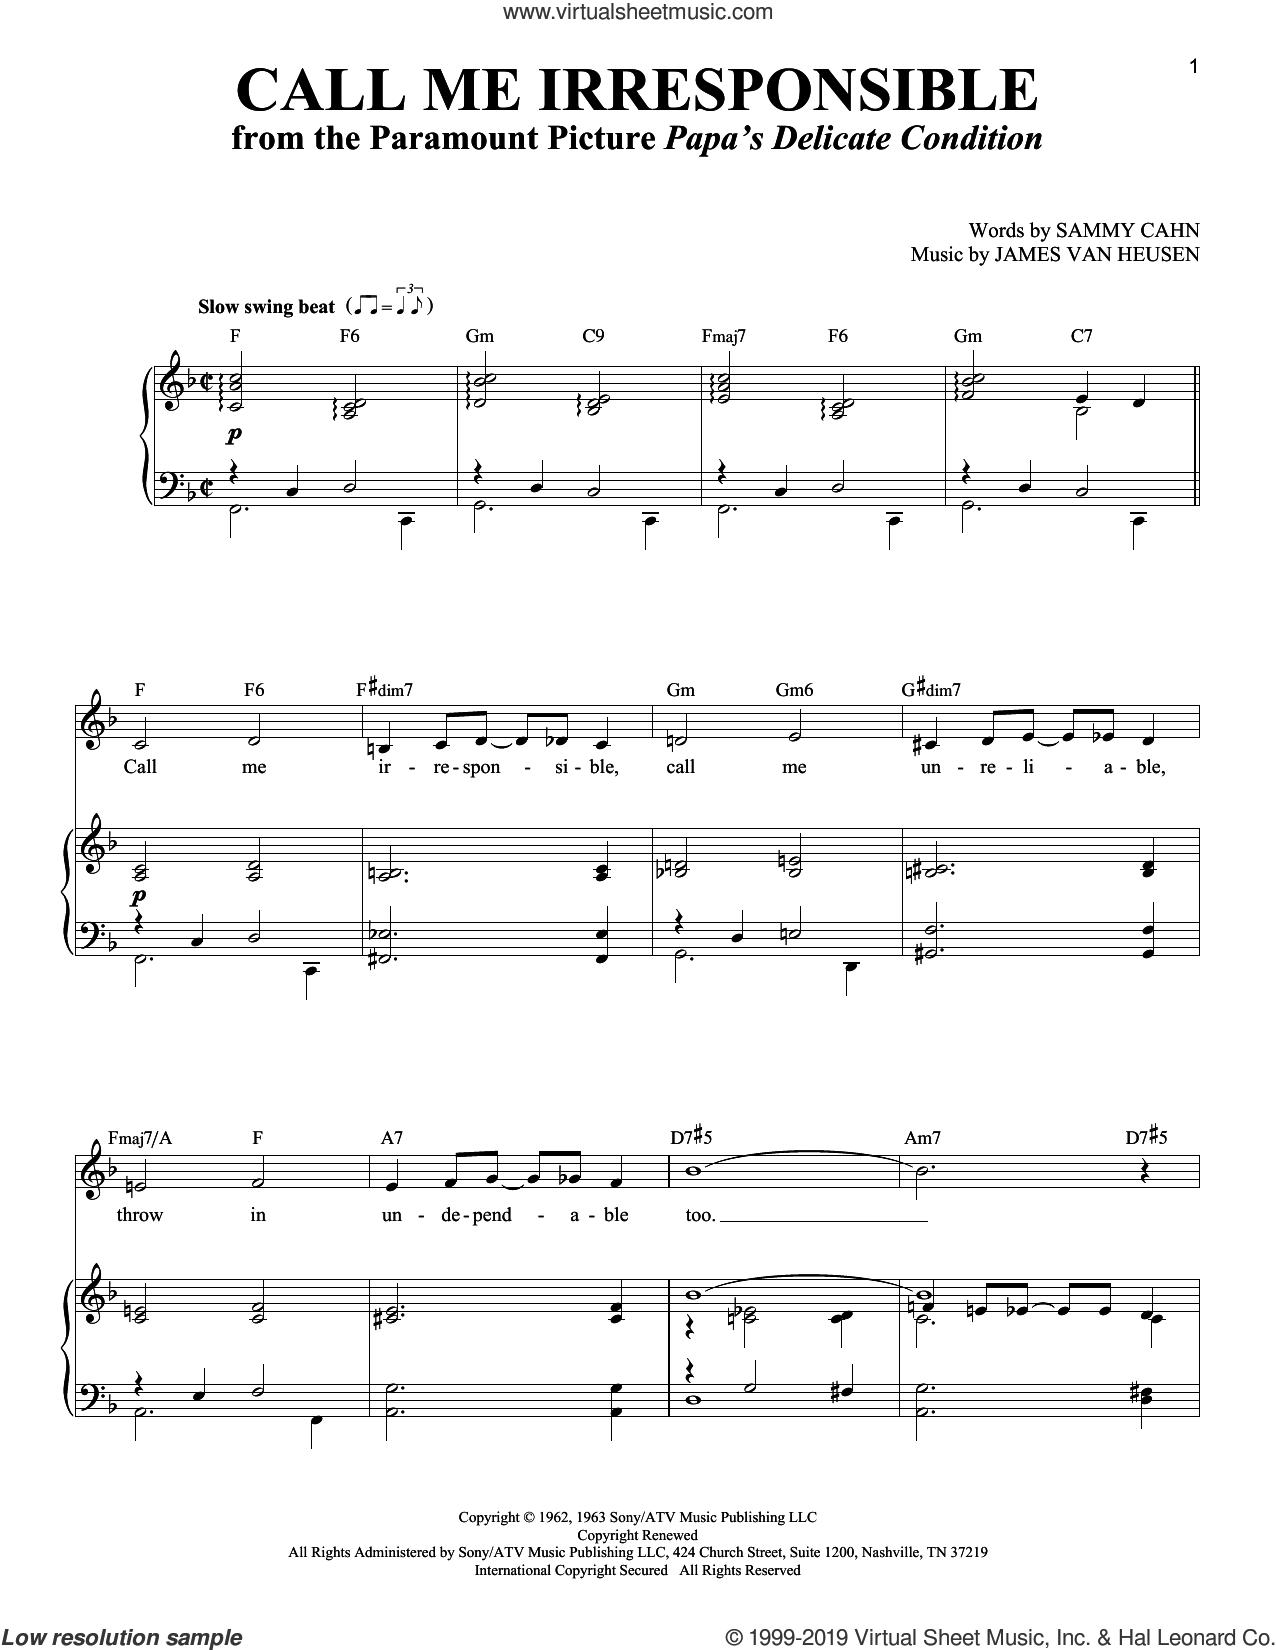 Call Me Irresponsible sheet music for voice and piano , Dinah Washington, Frank Sinatra, Jack Jones, Richard Walters, Jimmy van Heusen and Sammy Cahn, intermediate skill level